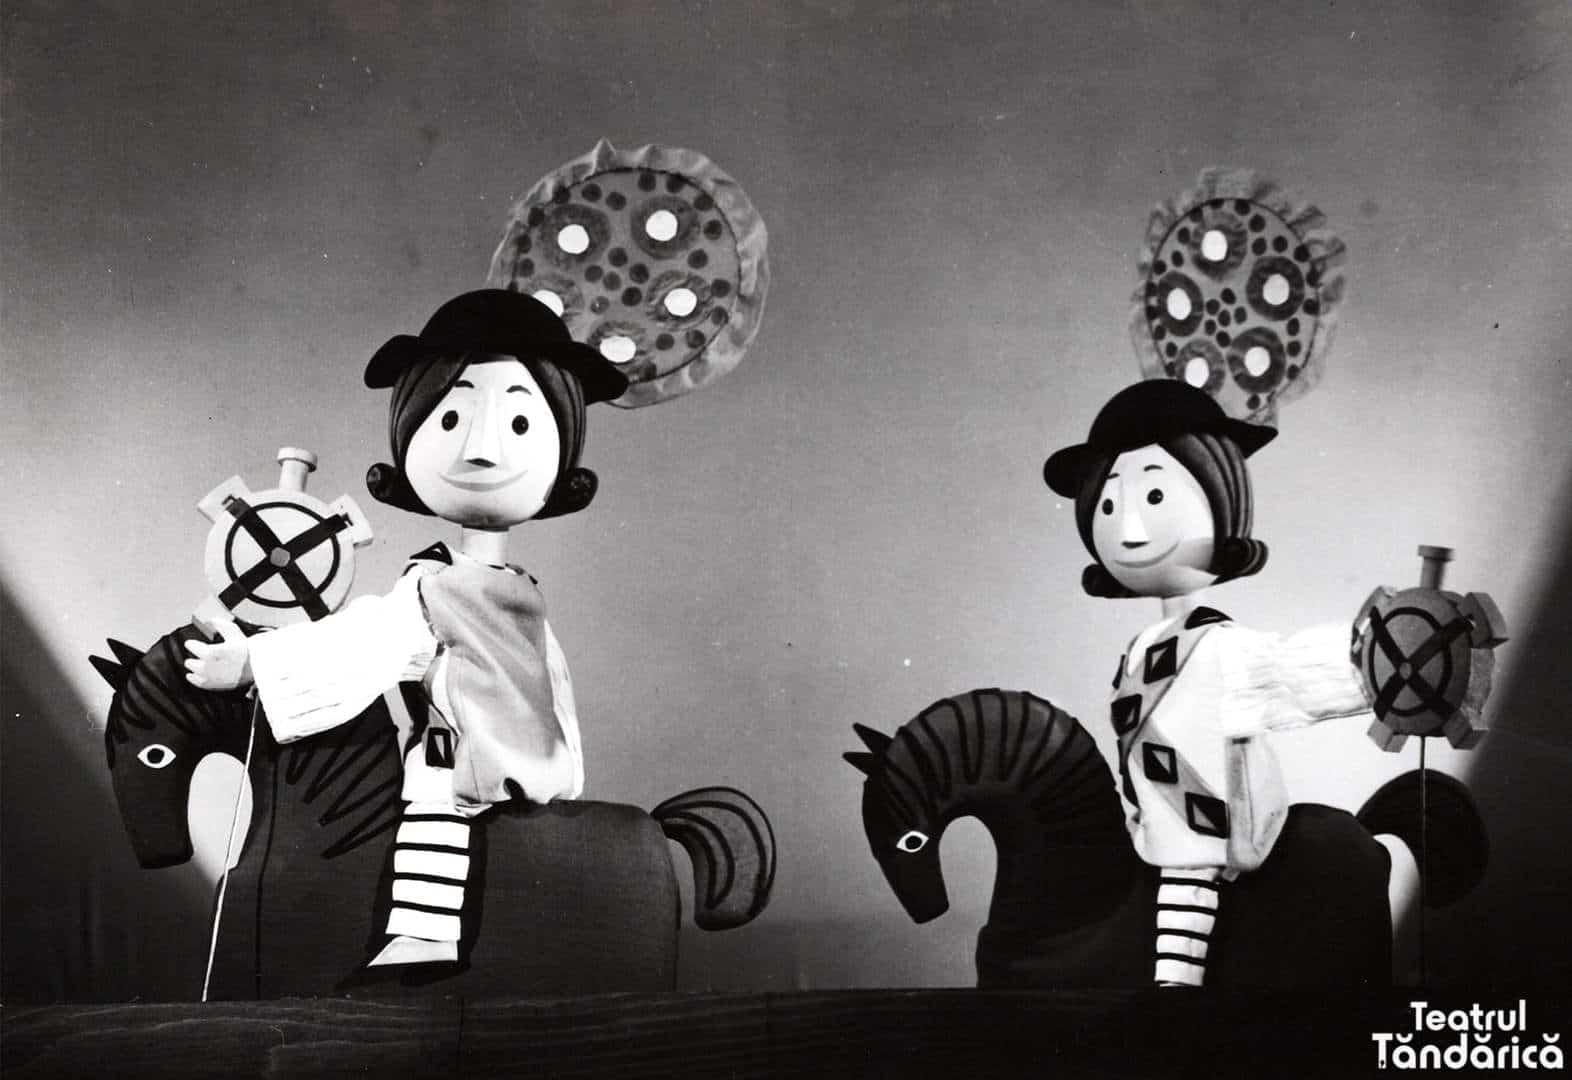 Teatrul-Tandarica-75-ani-episodul-14-4-1